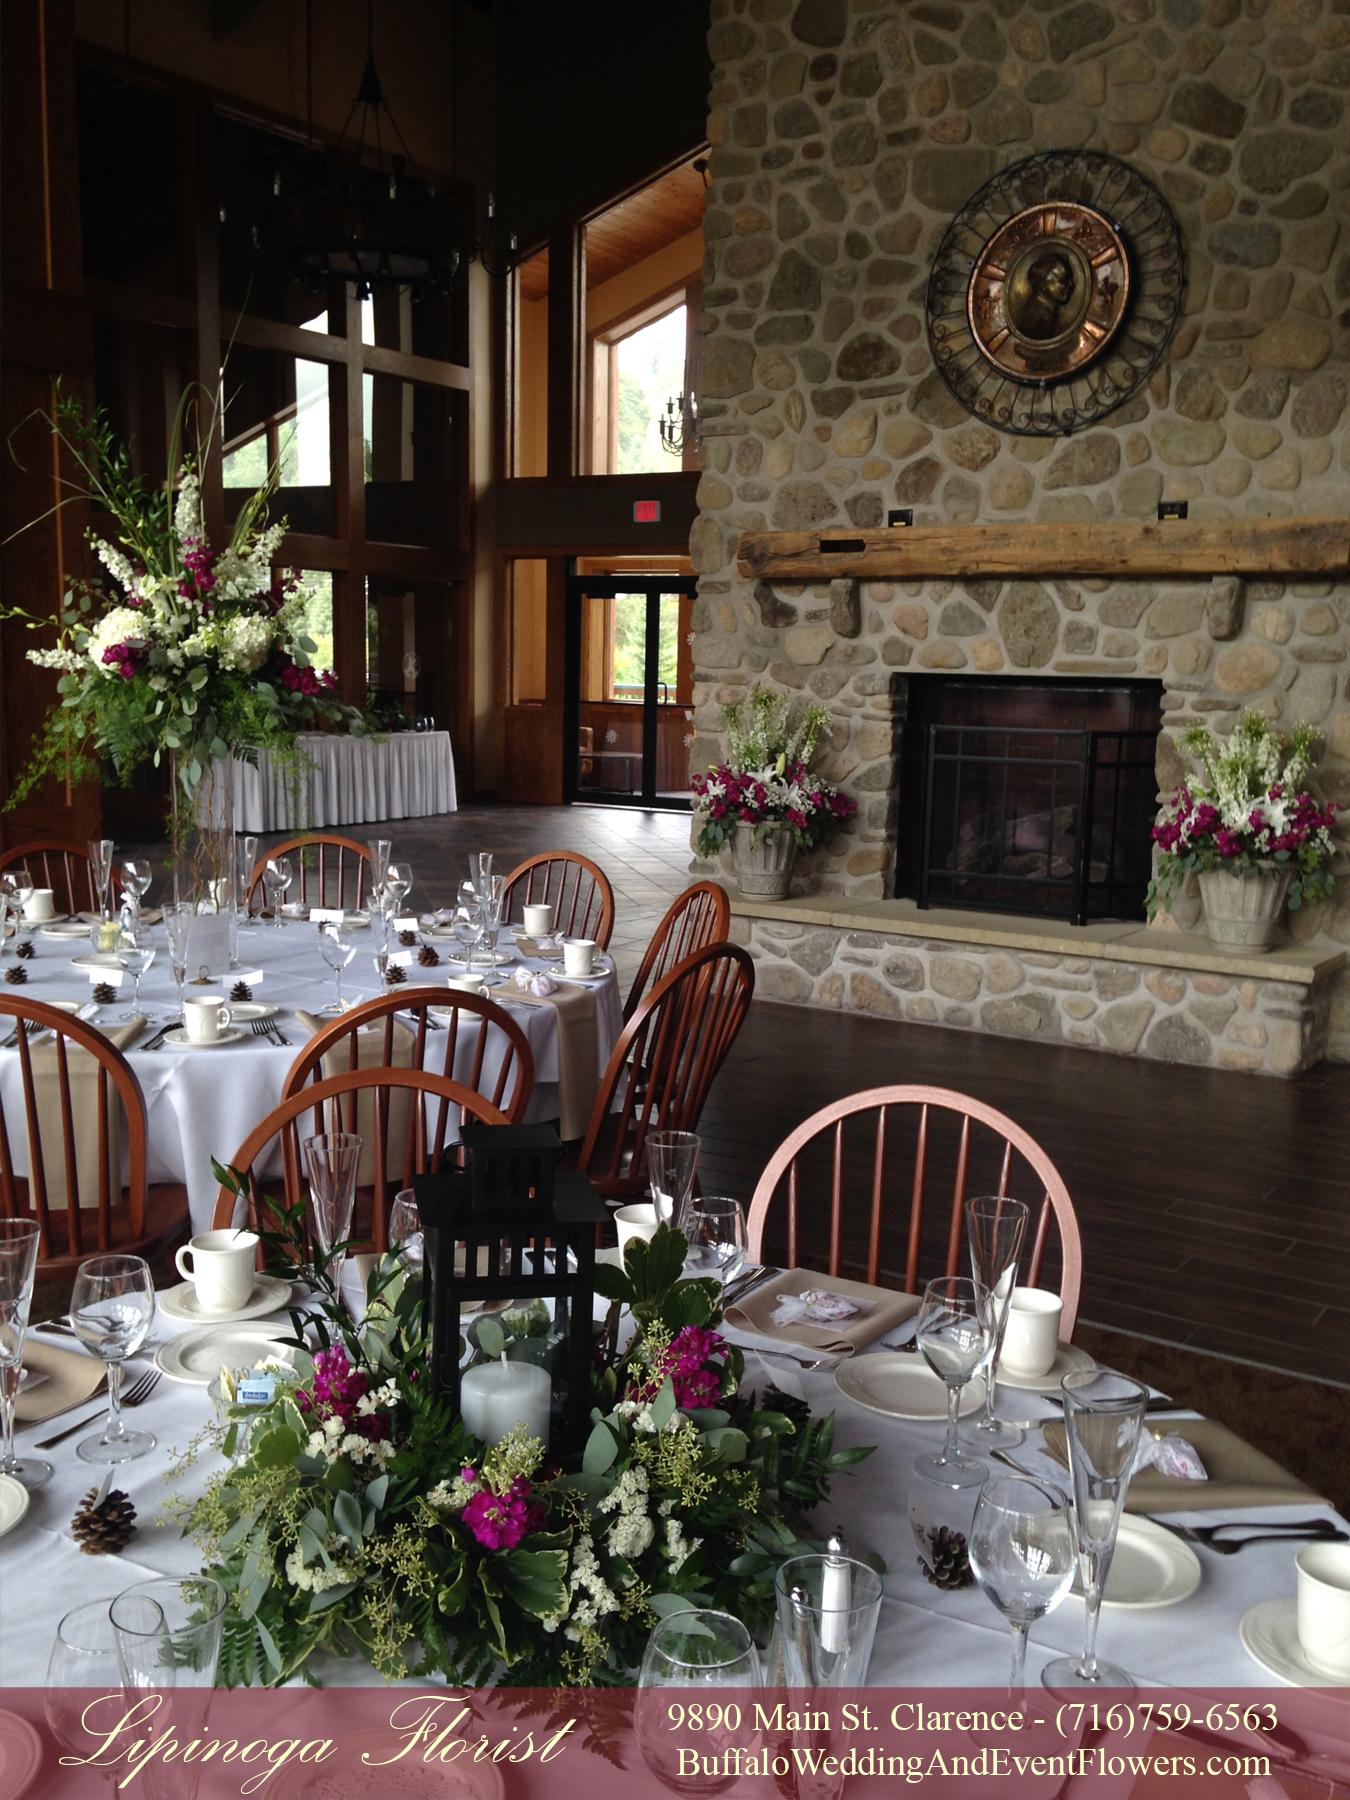 Rustic Ceremony Arch Buffalo Wedding Amp Event Flowers By Lipinoga Florist